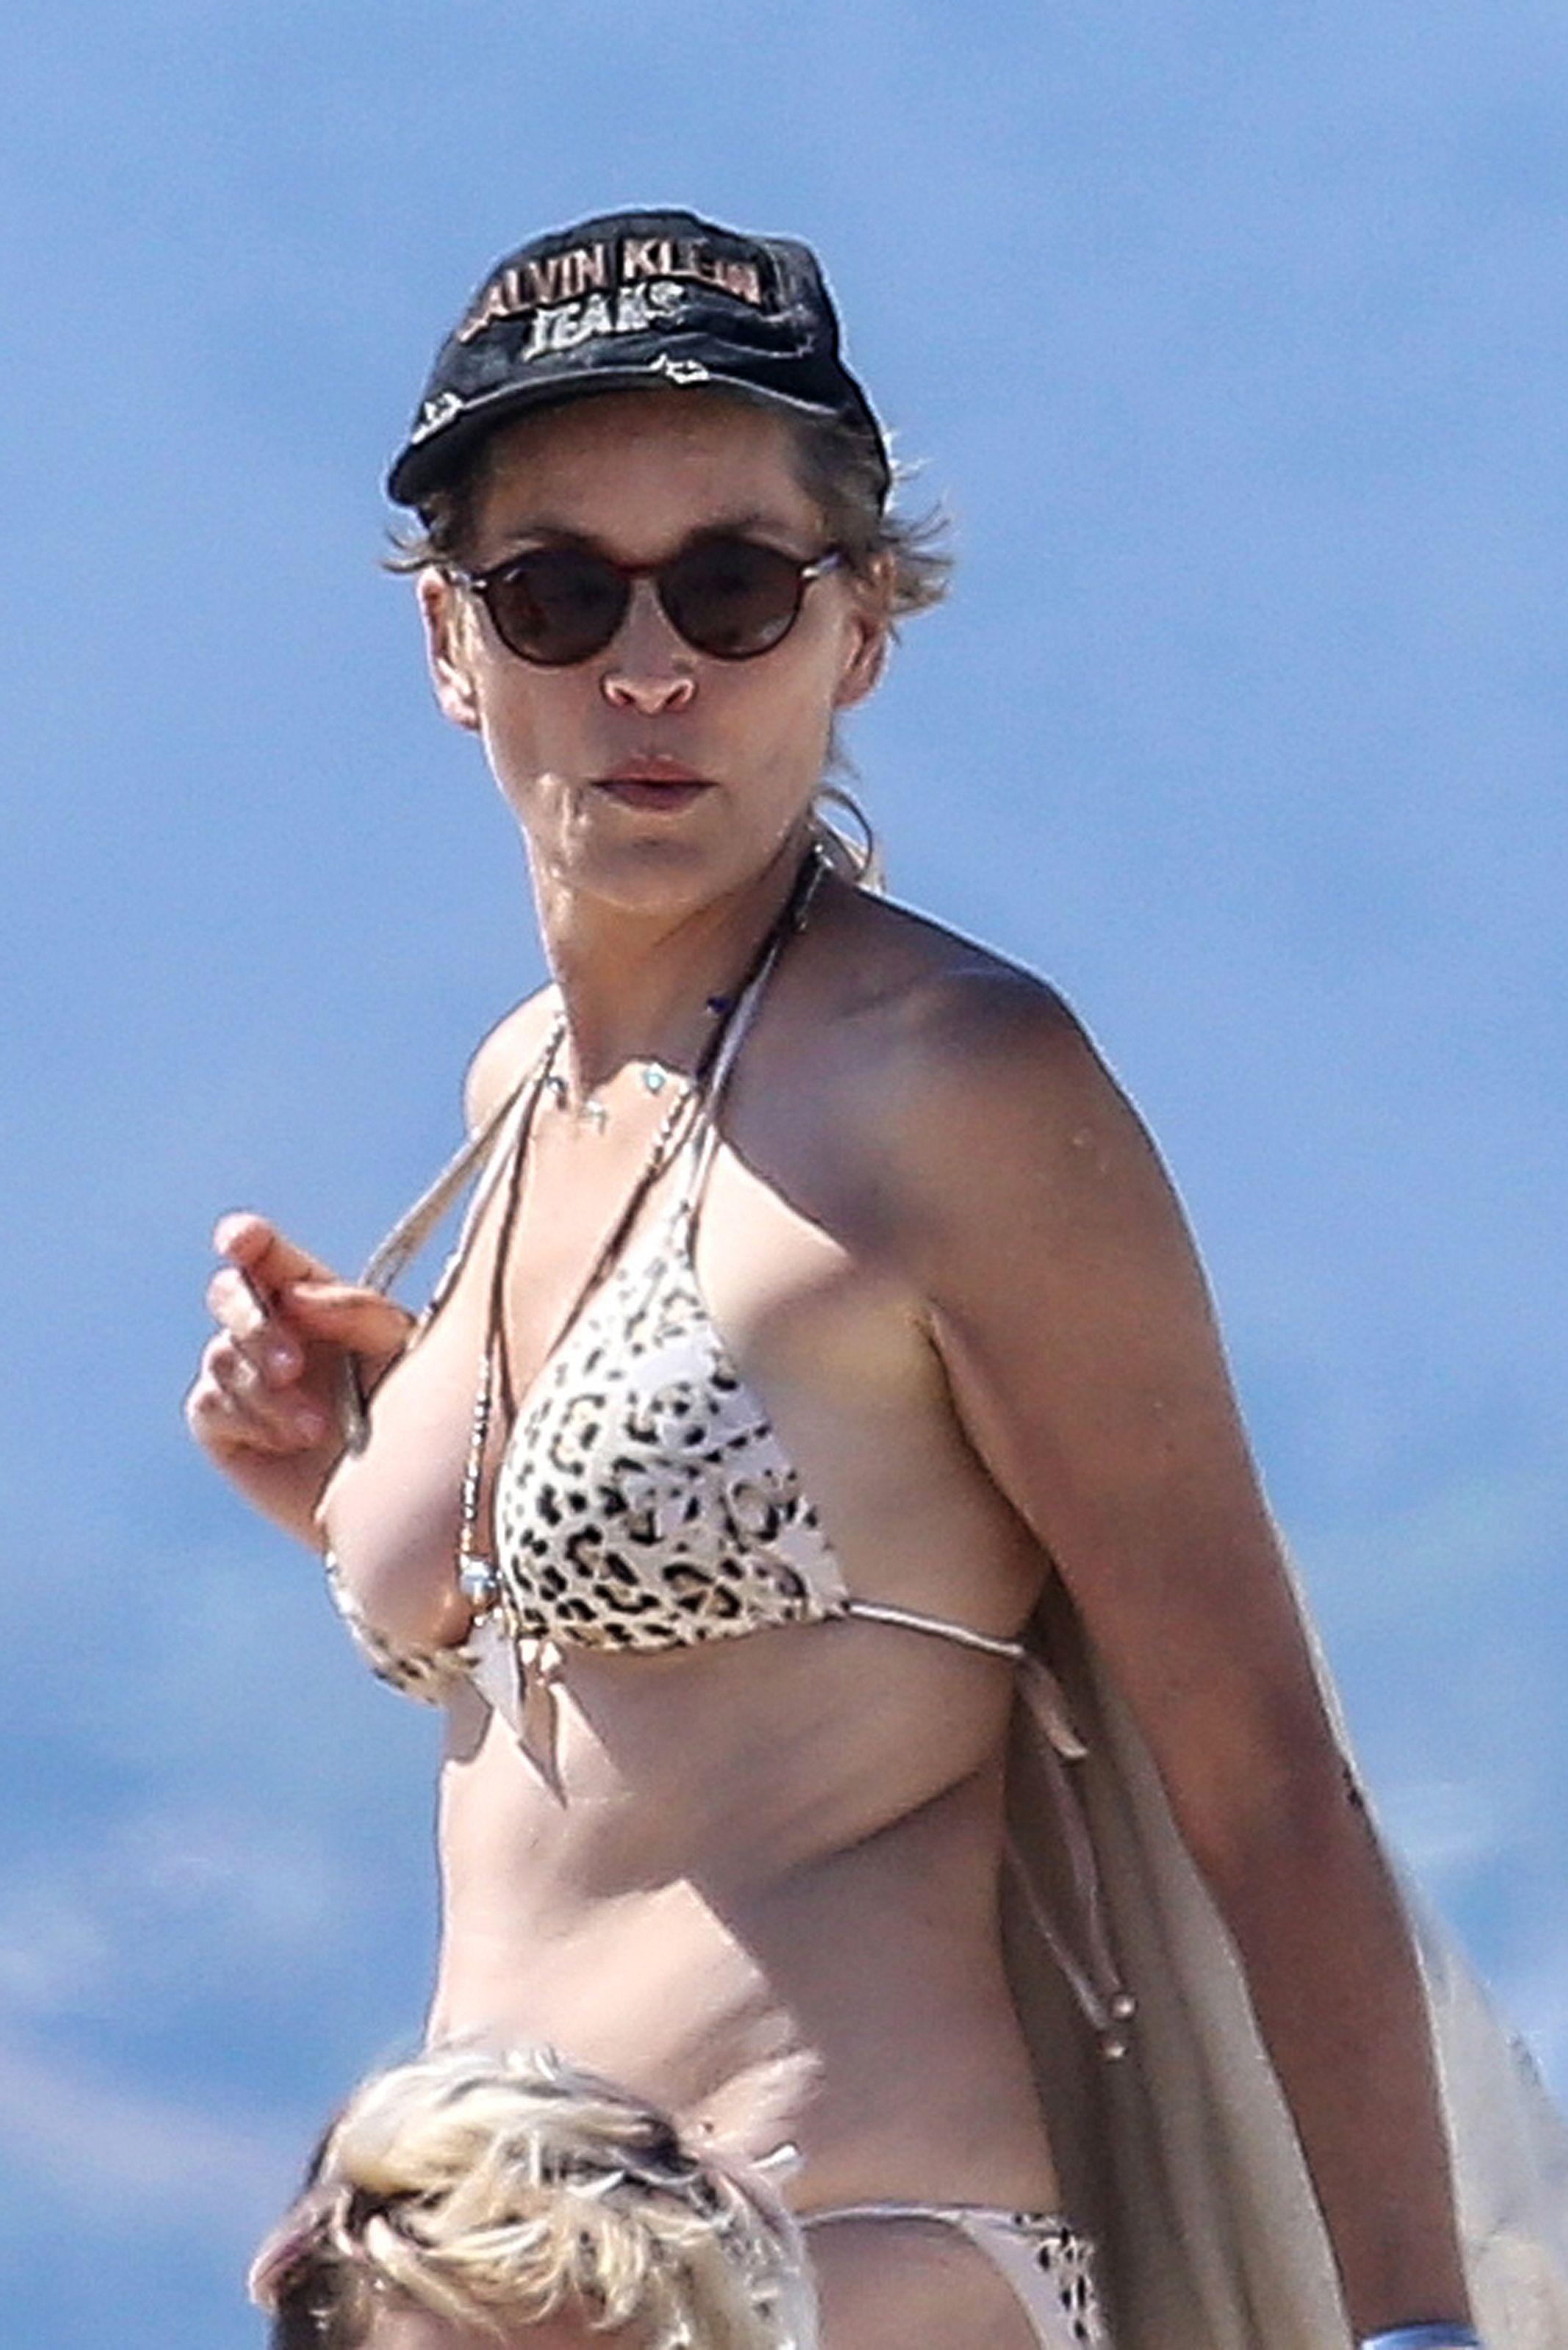 Sharon-Stone-Nipple-Slip-On-The-Beach-In-Venice-06 -8299